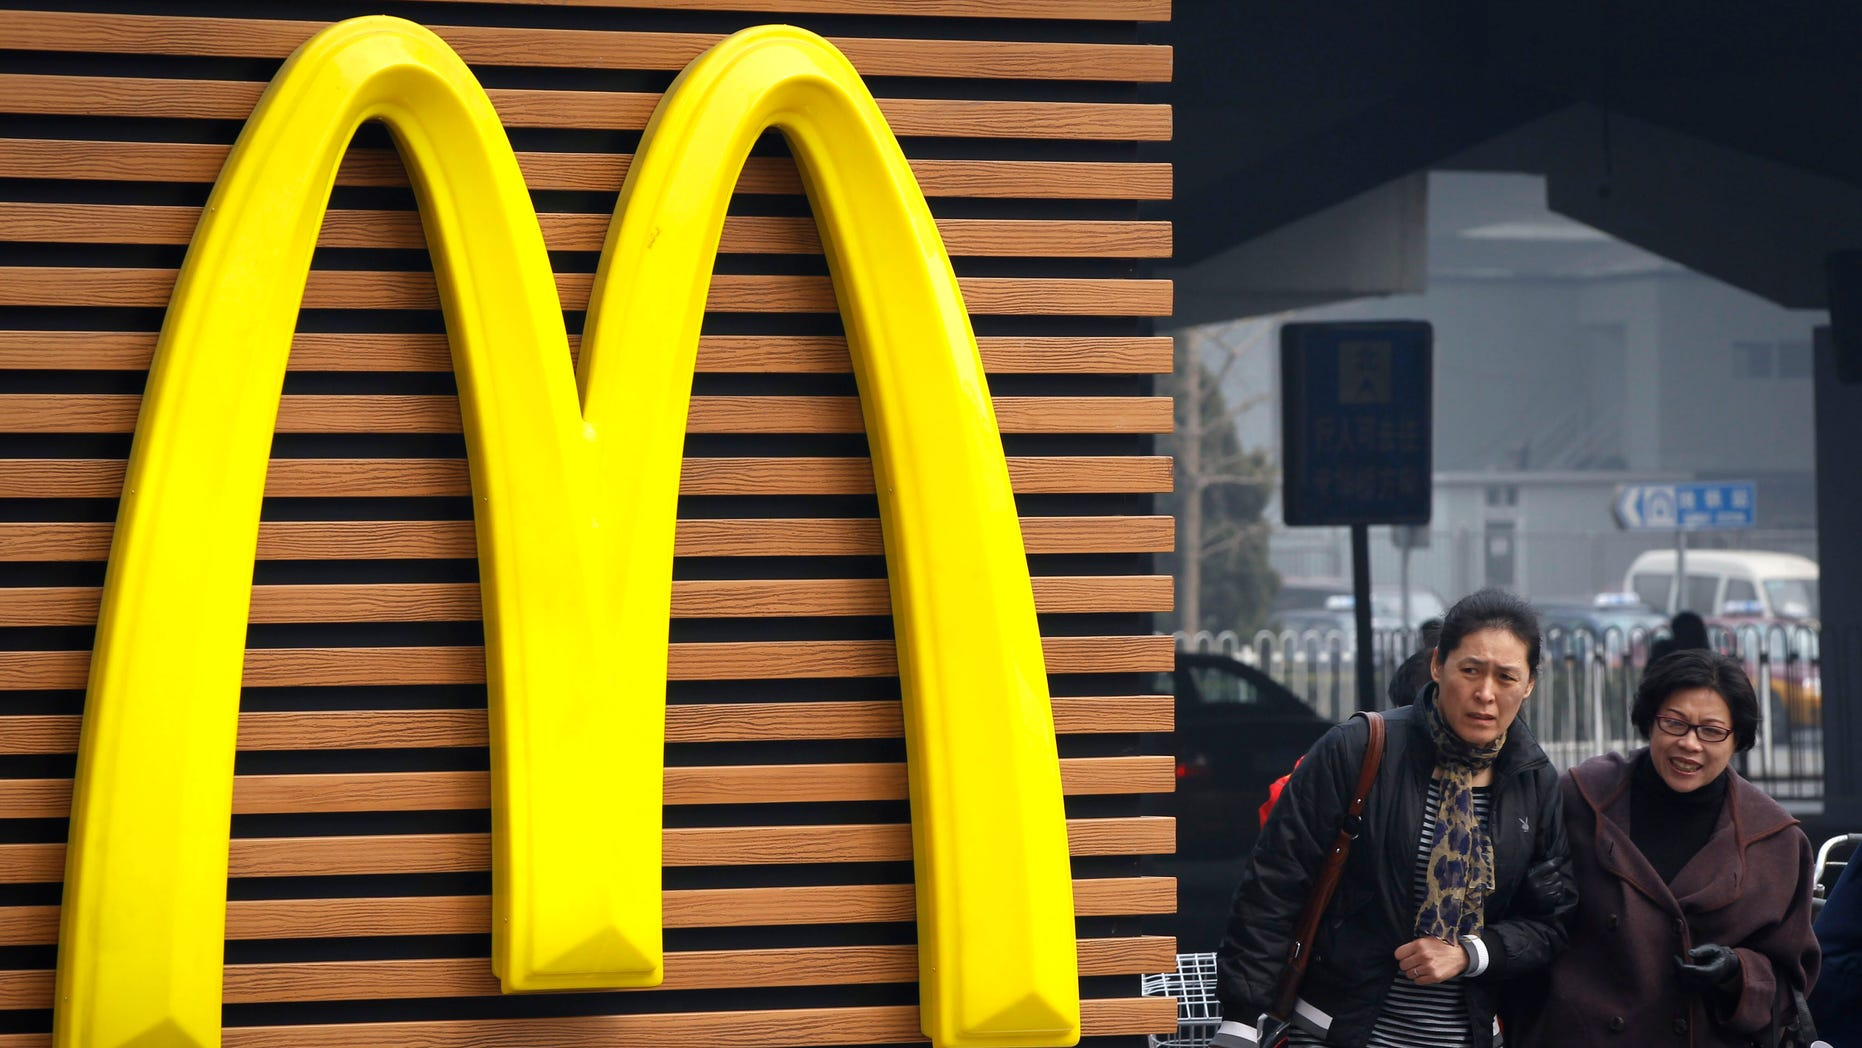 Mar. 16, 2012: Chinese women walk past a McDonald's sign in Beijing.